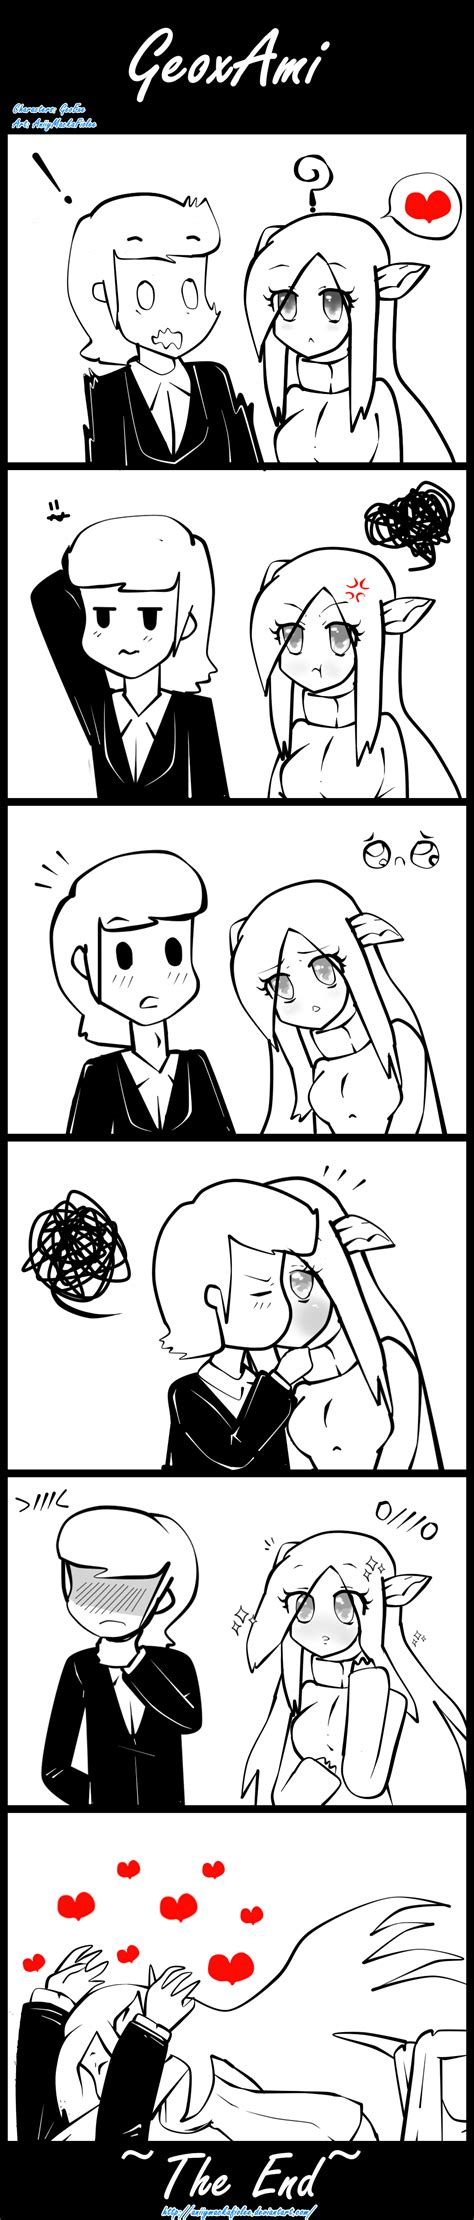 anime comic mini comic geoami by aniiymackafiolee on deviantart